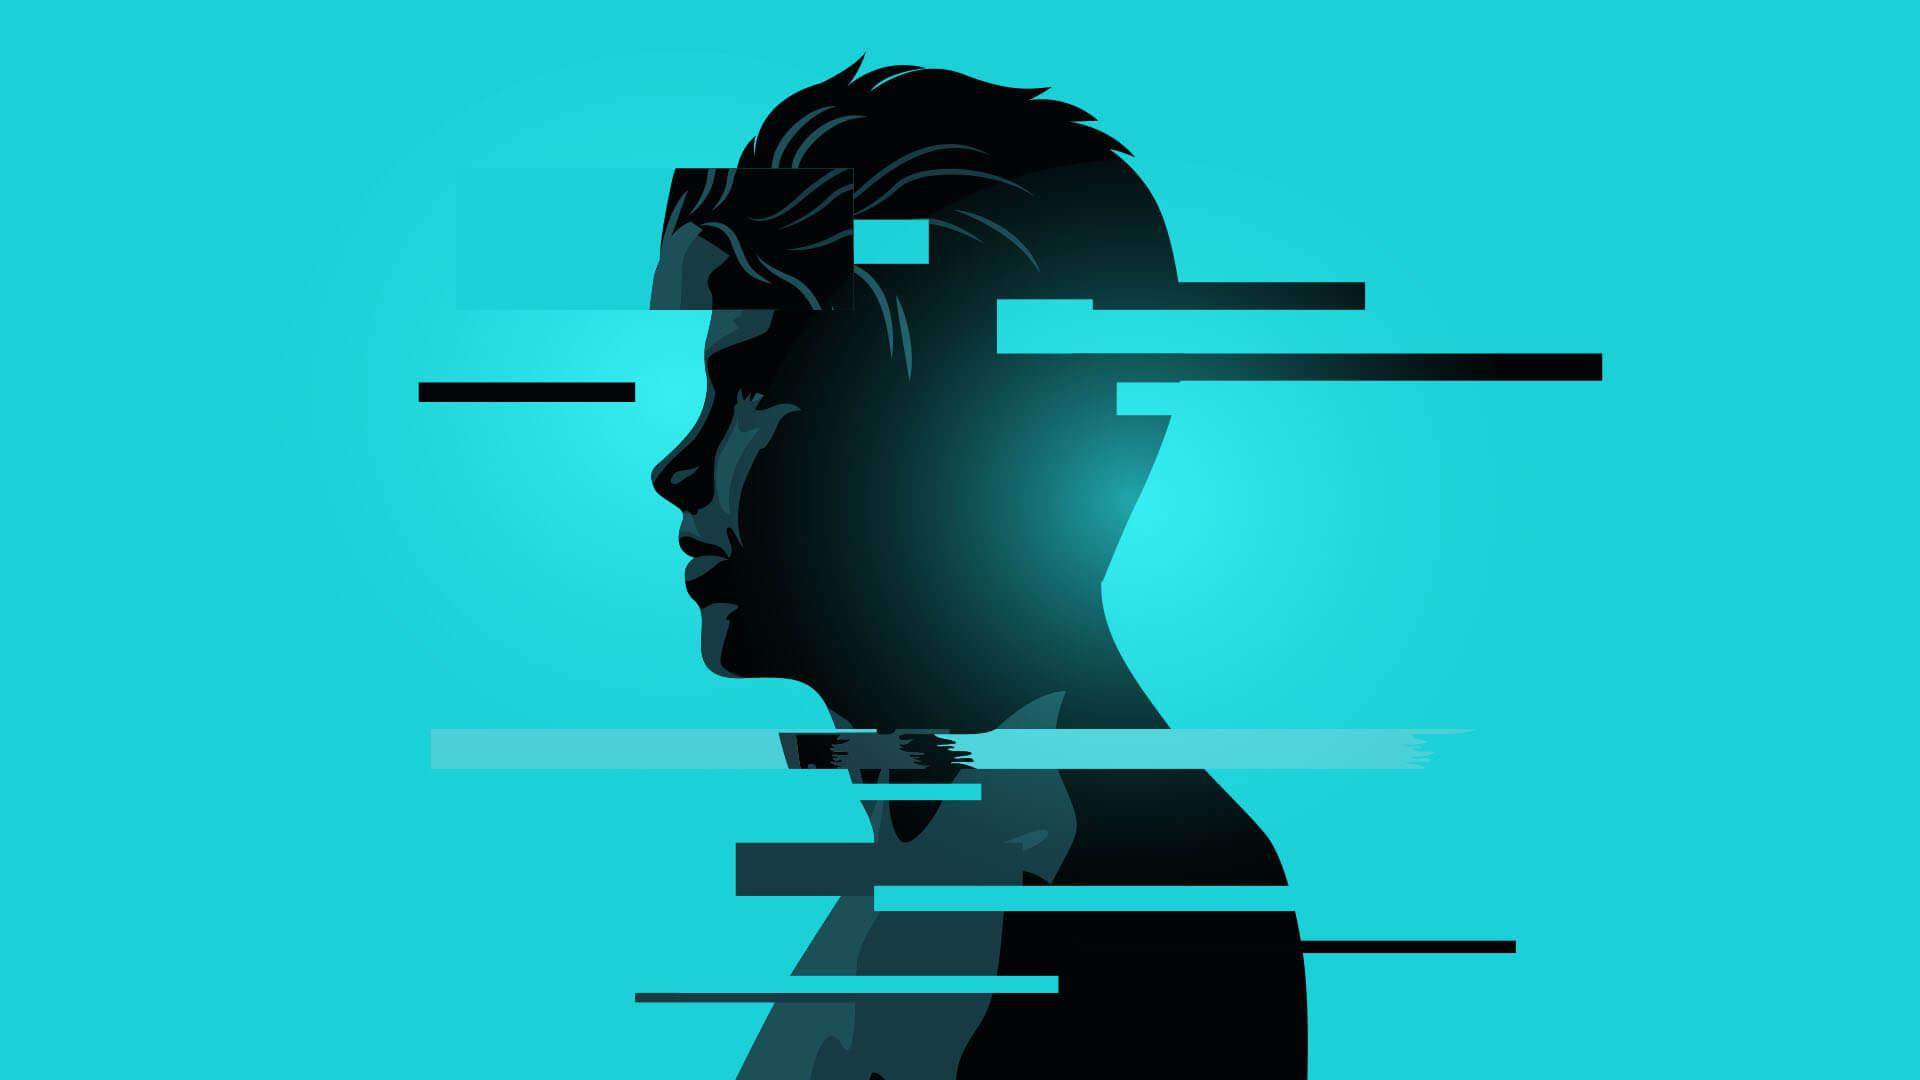 Mental Health Treatment | Does Stigma Affect Outcomes?